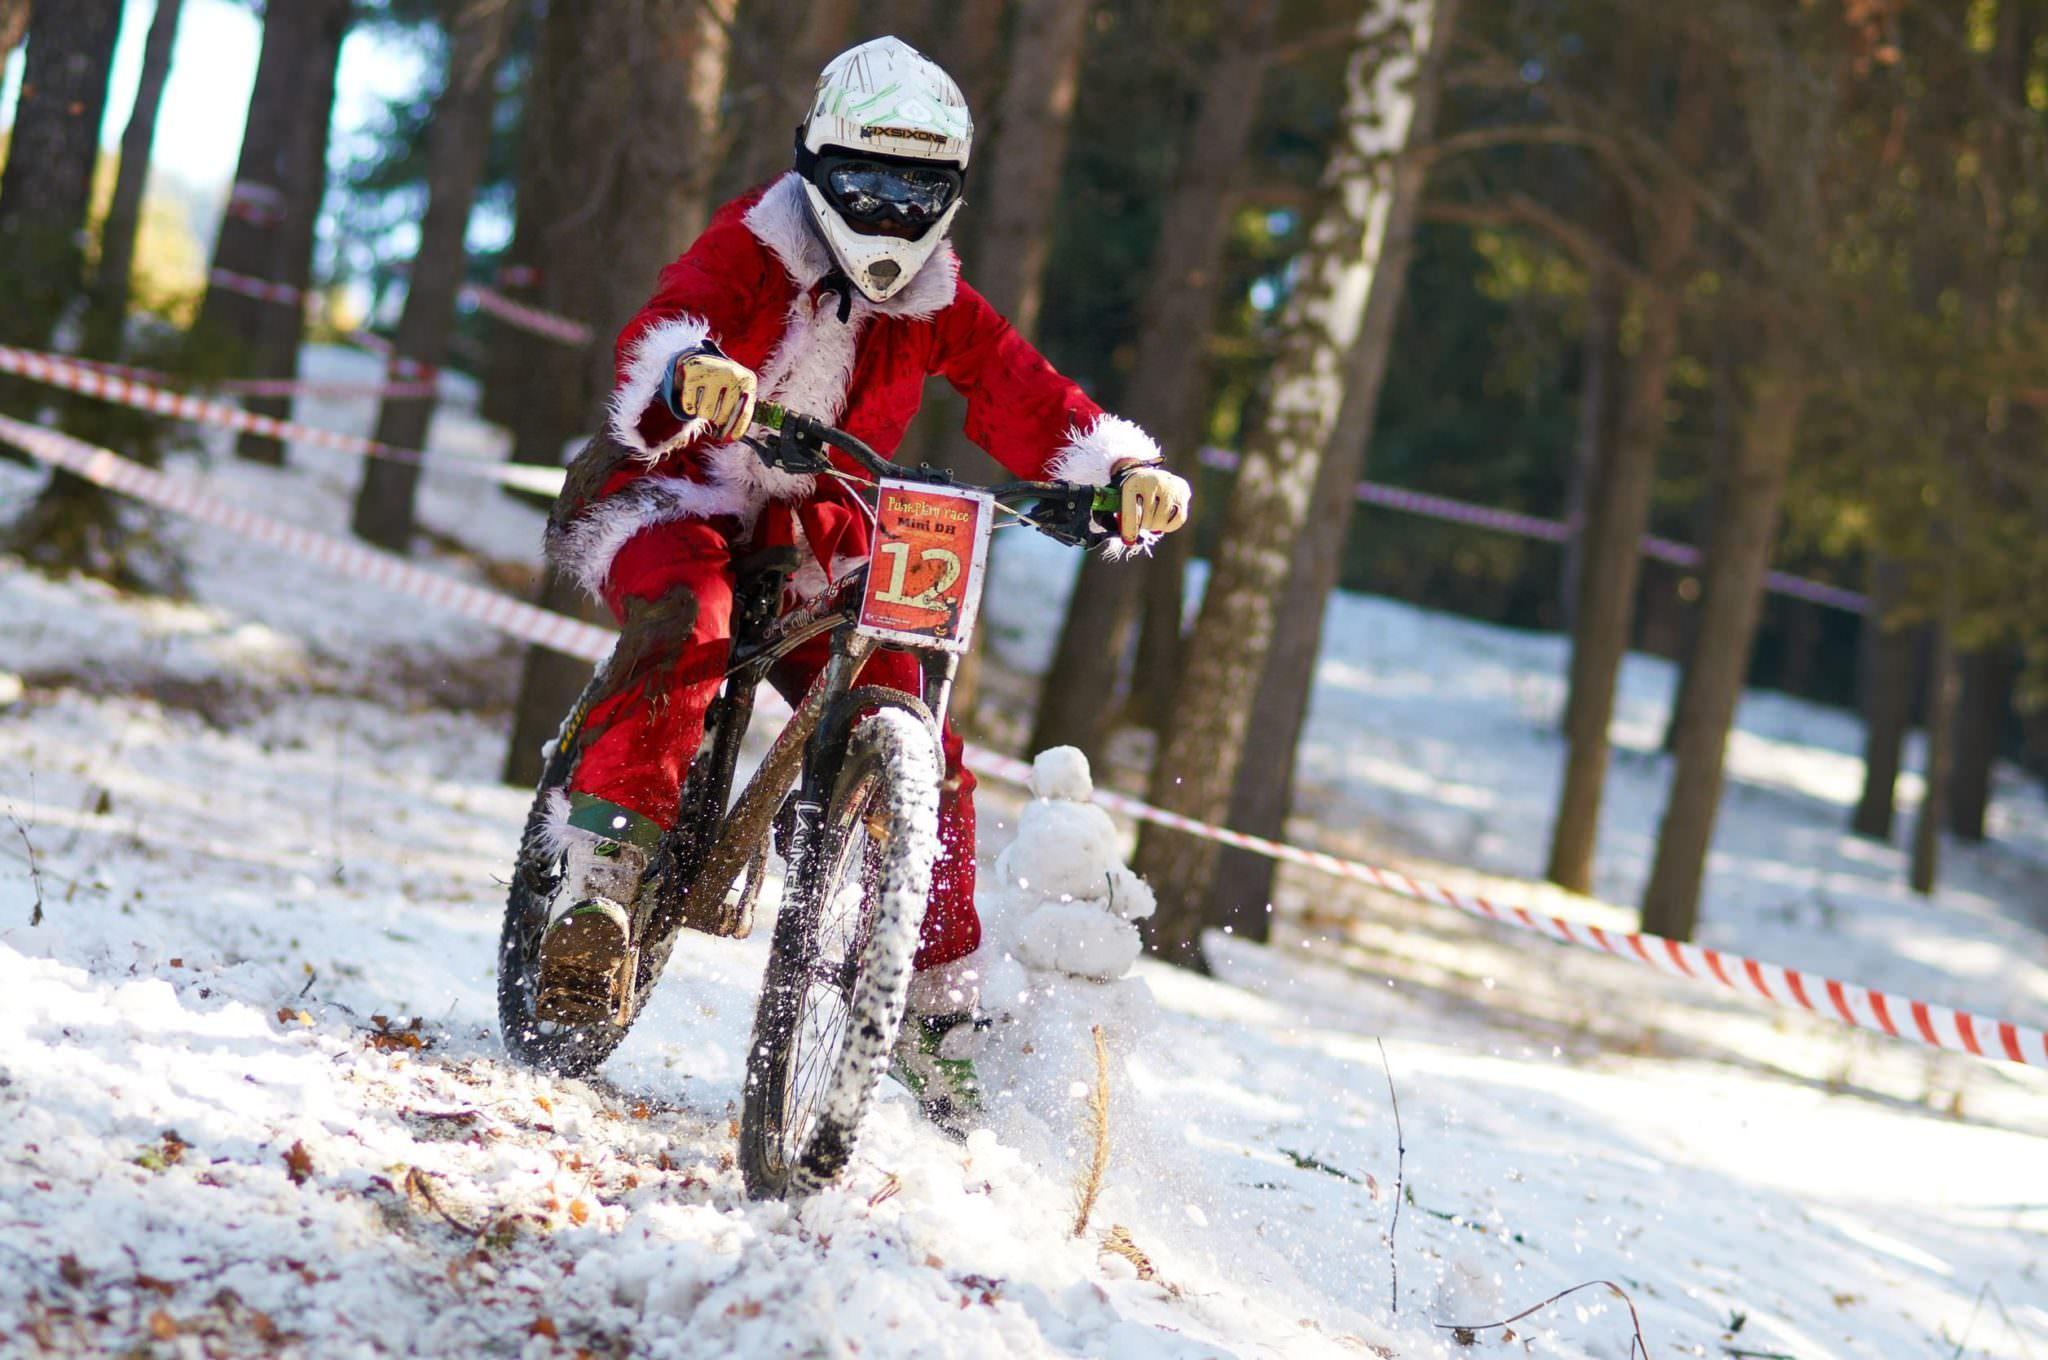 Extreme ice biking